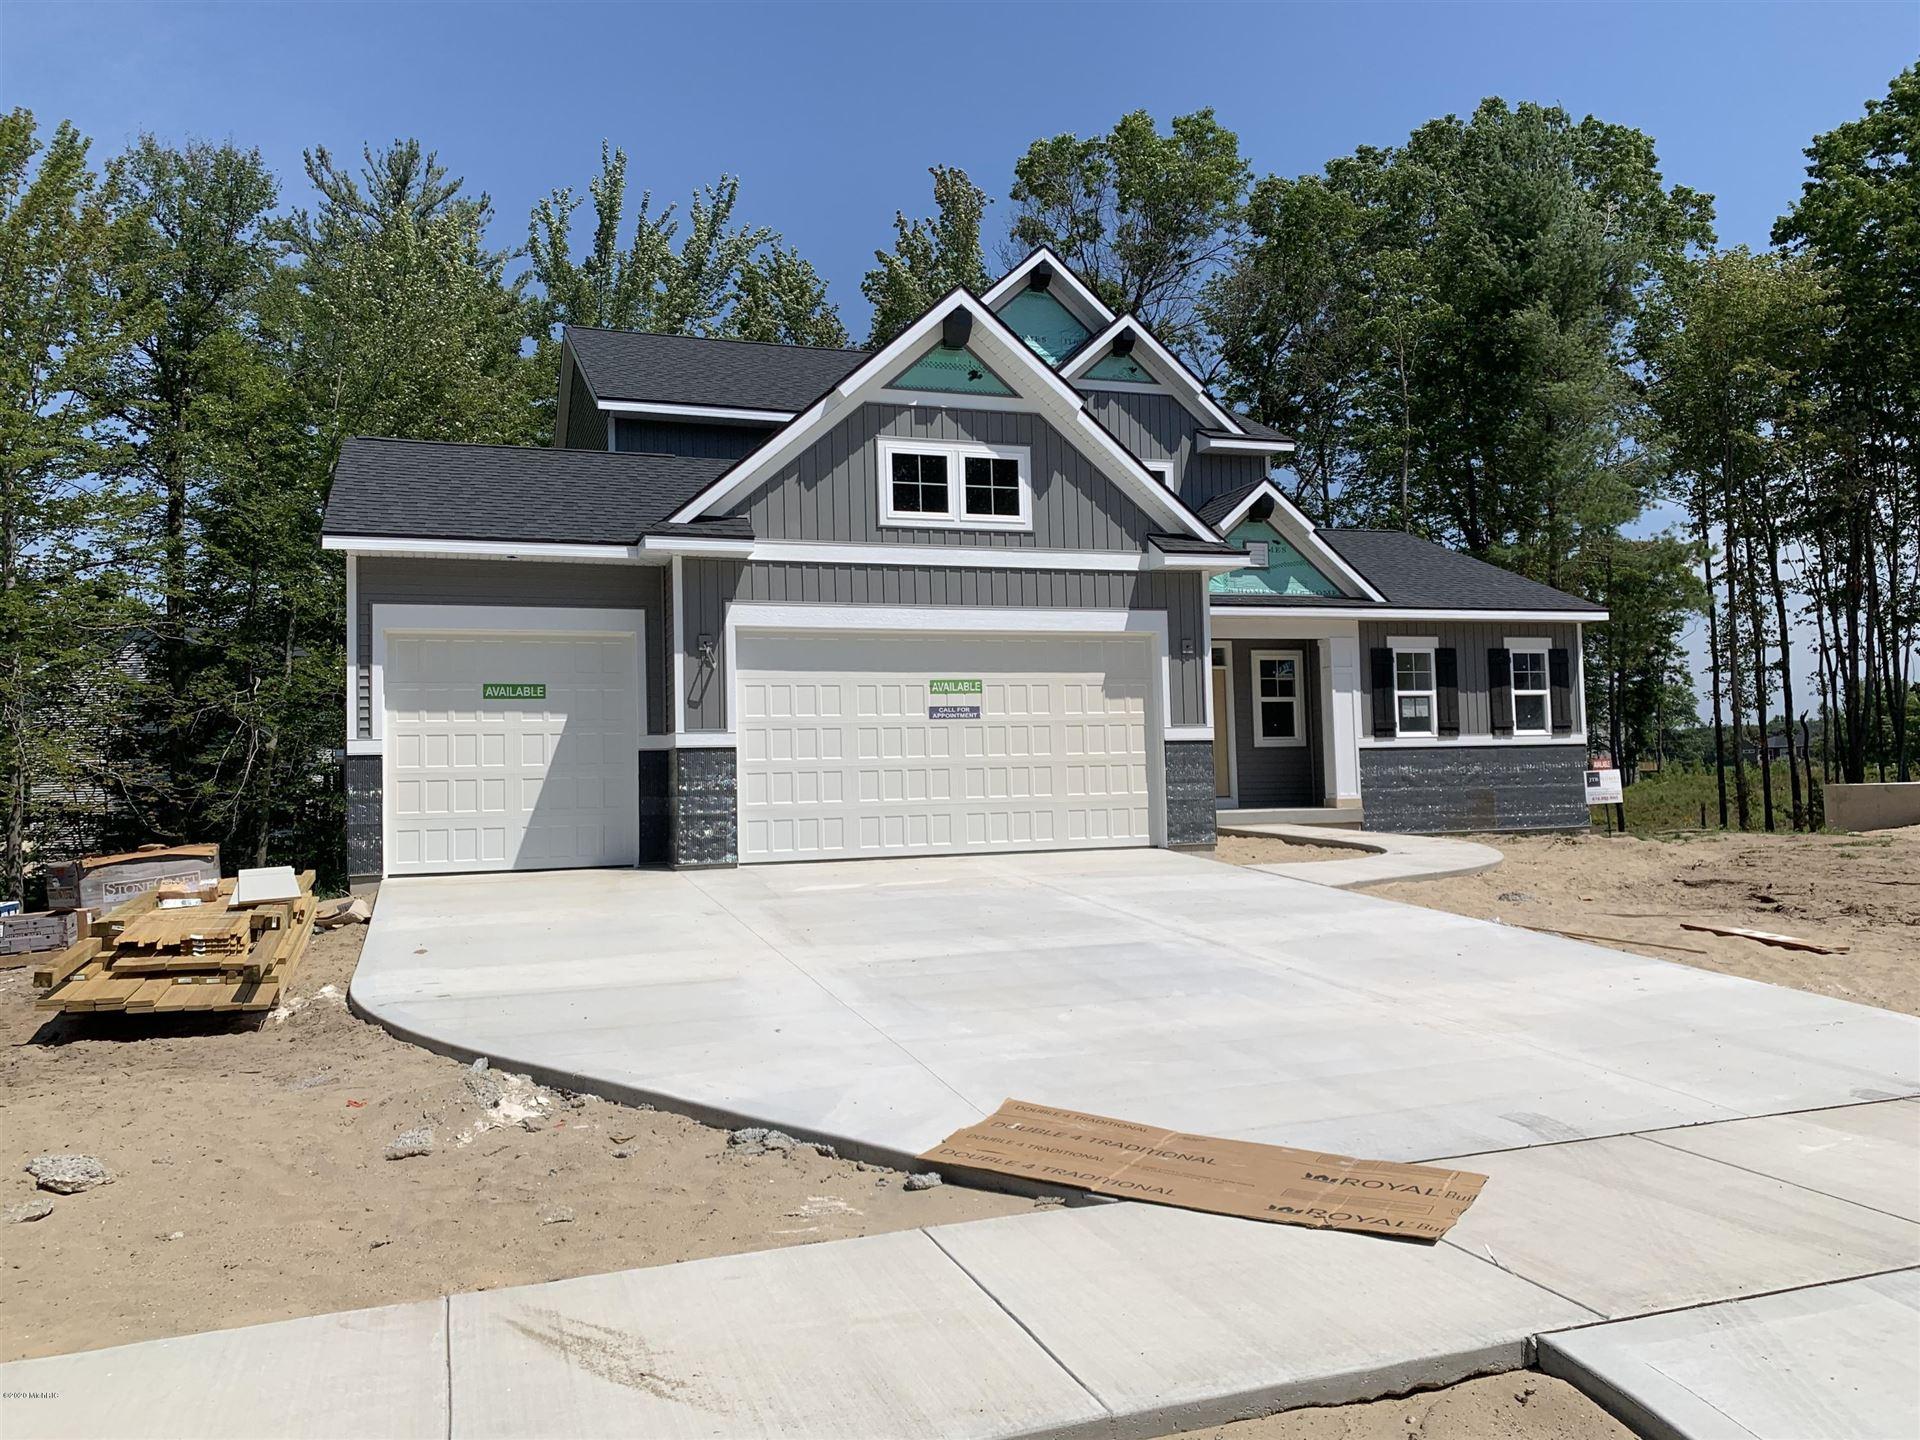 Photo of Lot 8 Spring Tree Drive #8, Spring Lake, MI 49456 (MLS # 20022171)